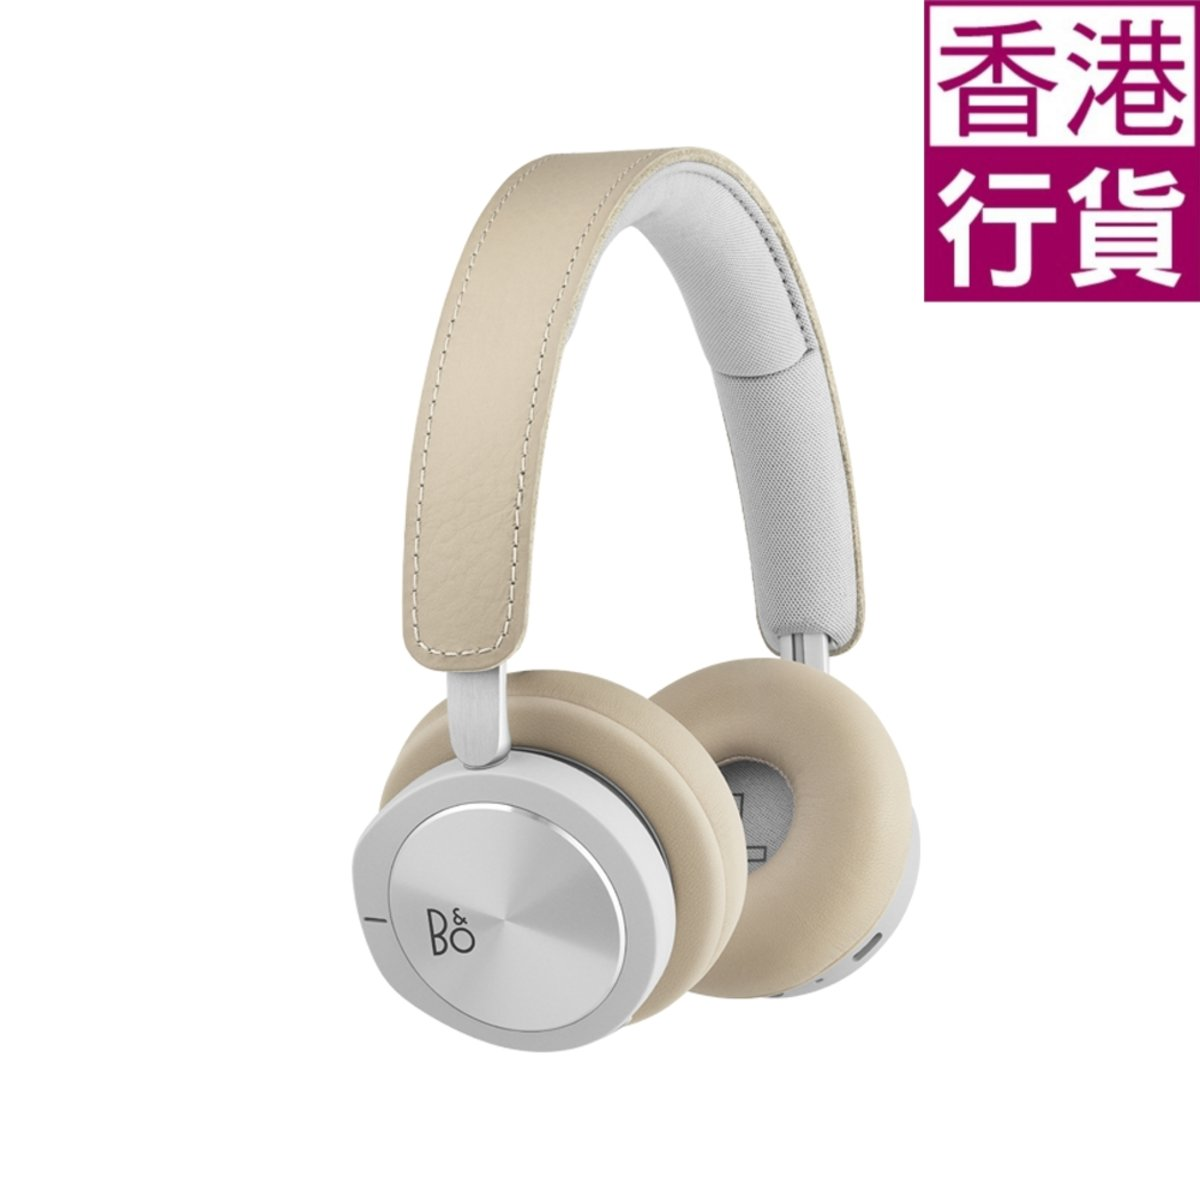 BeoPlay H8i (香港行貨) 無線降噪耳機 (銀色) (香港行貨)